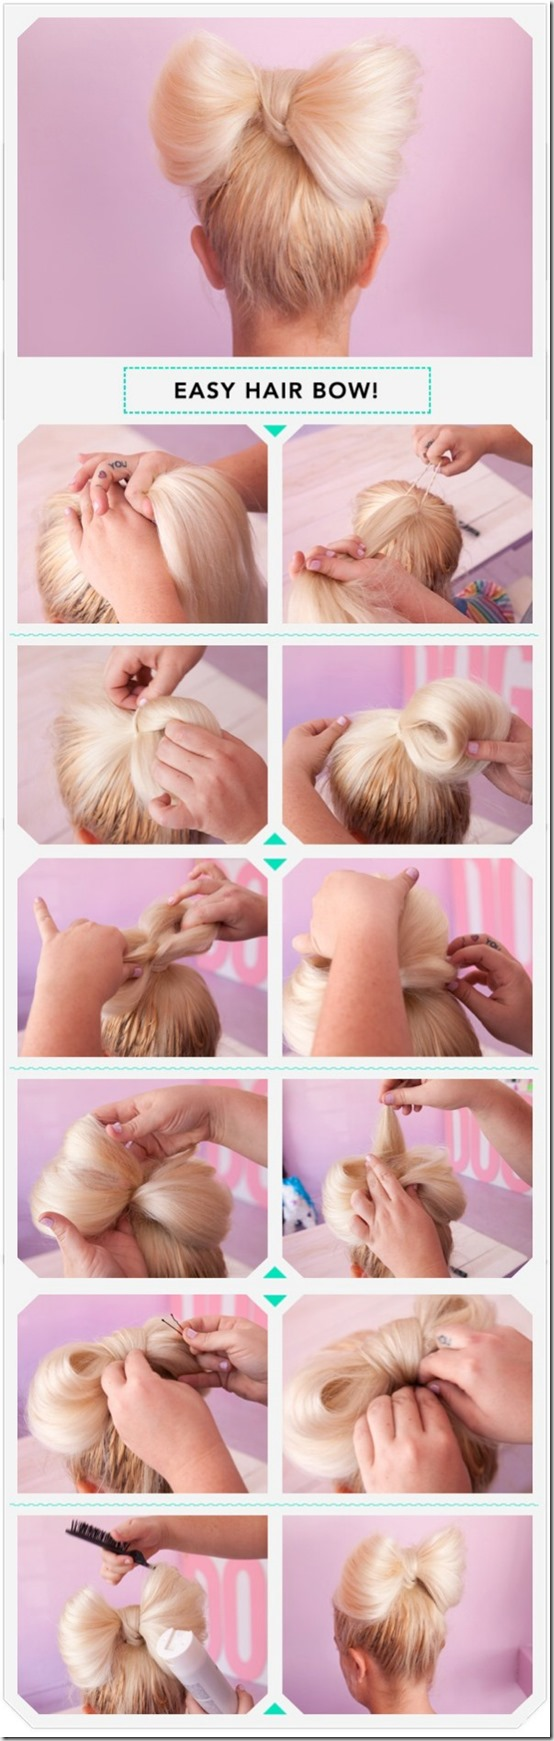 hair-bow-tutorial